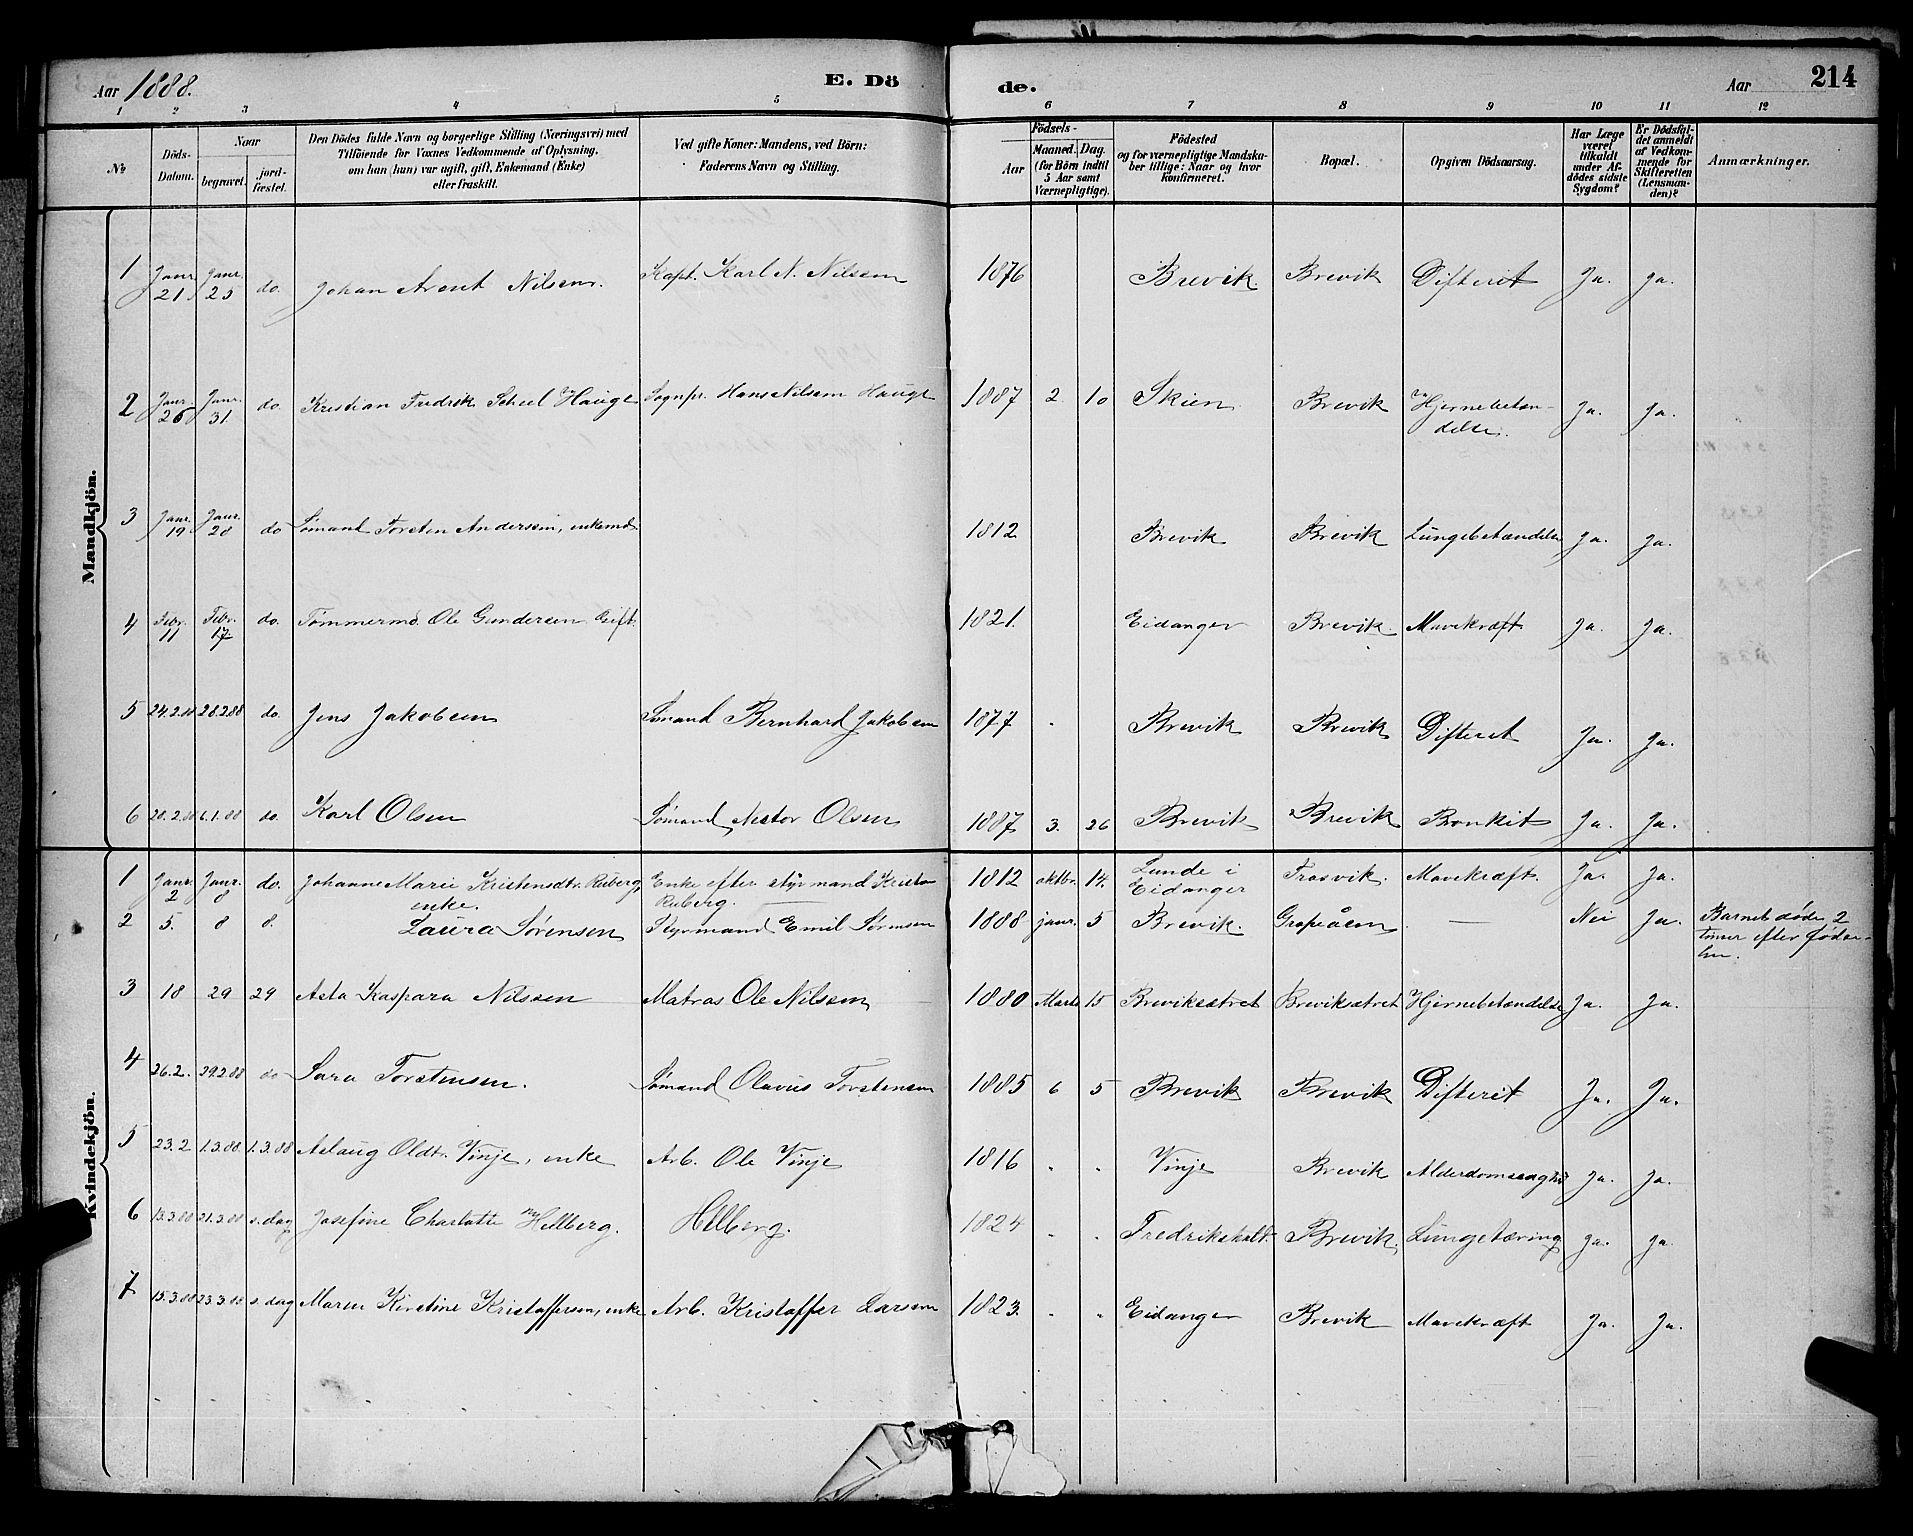 SAKO, Brevik kirkebøker, G/Ga/L0004: Klokkerbok nr. 4, 1882-1900, s. 214